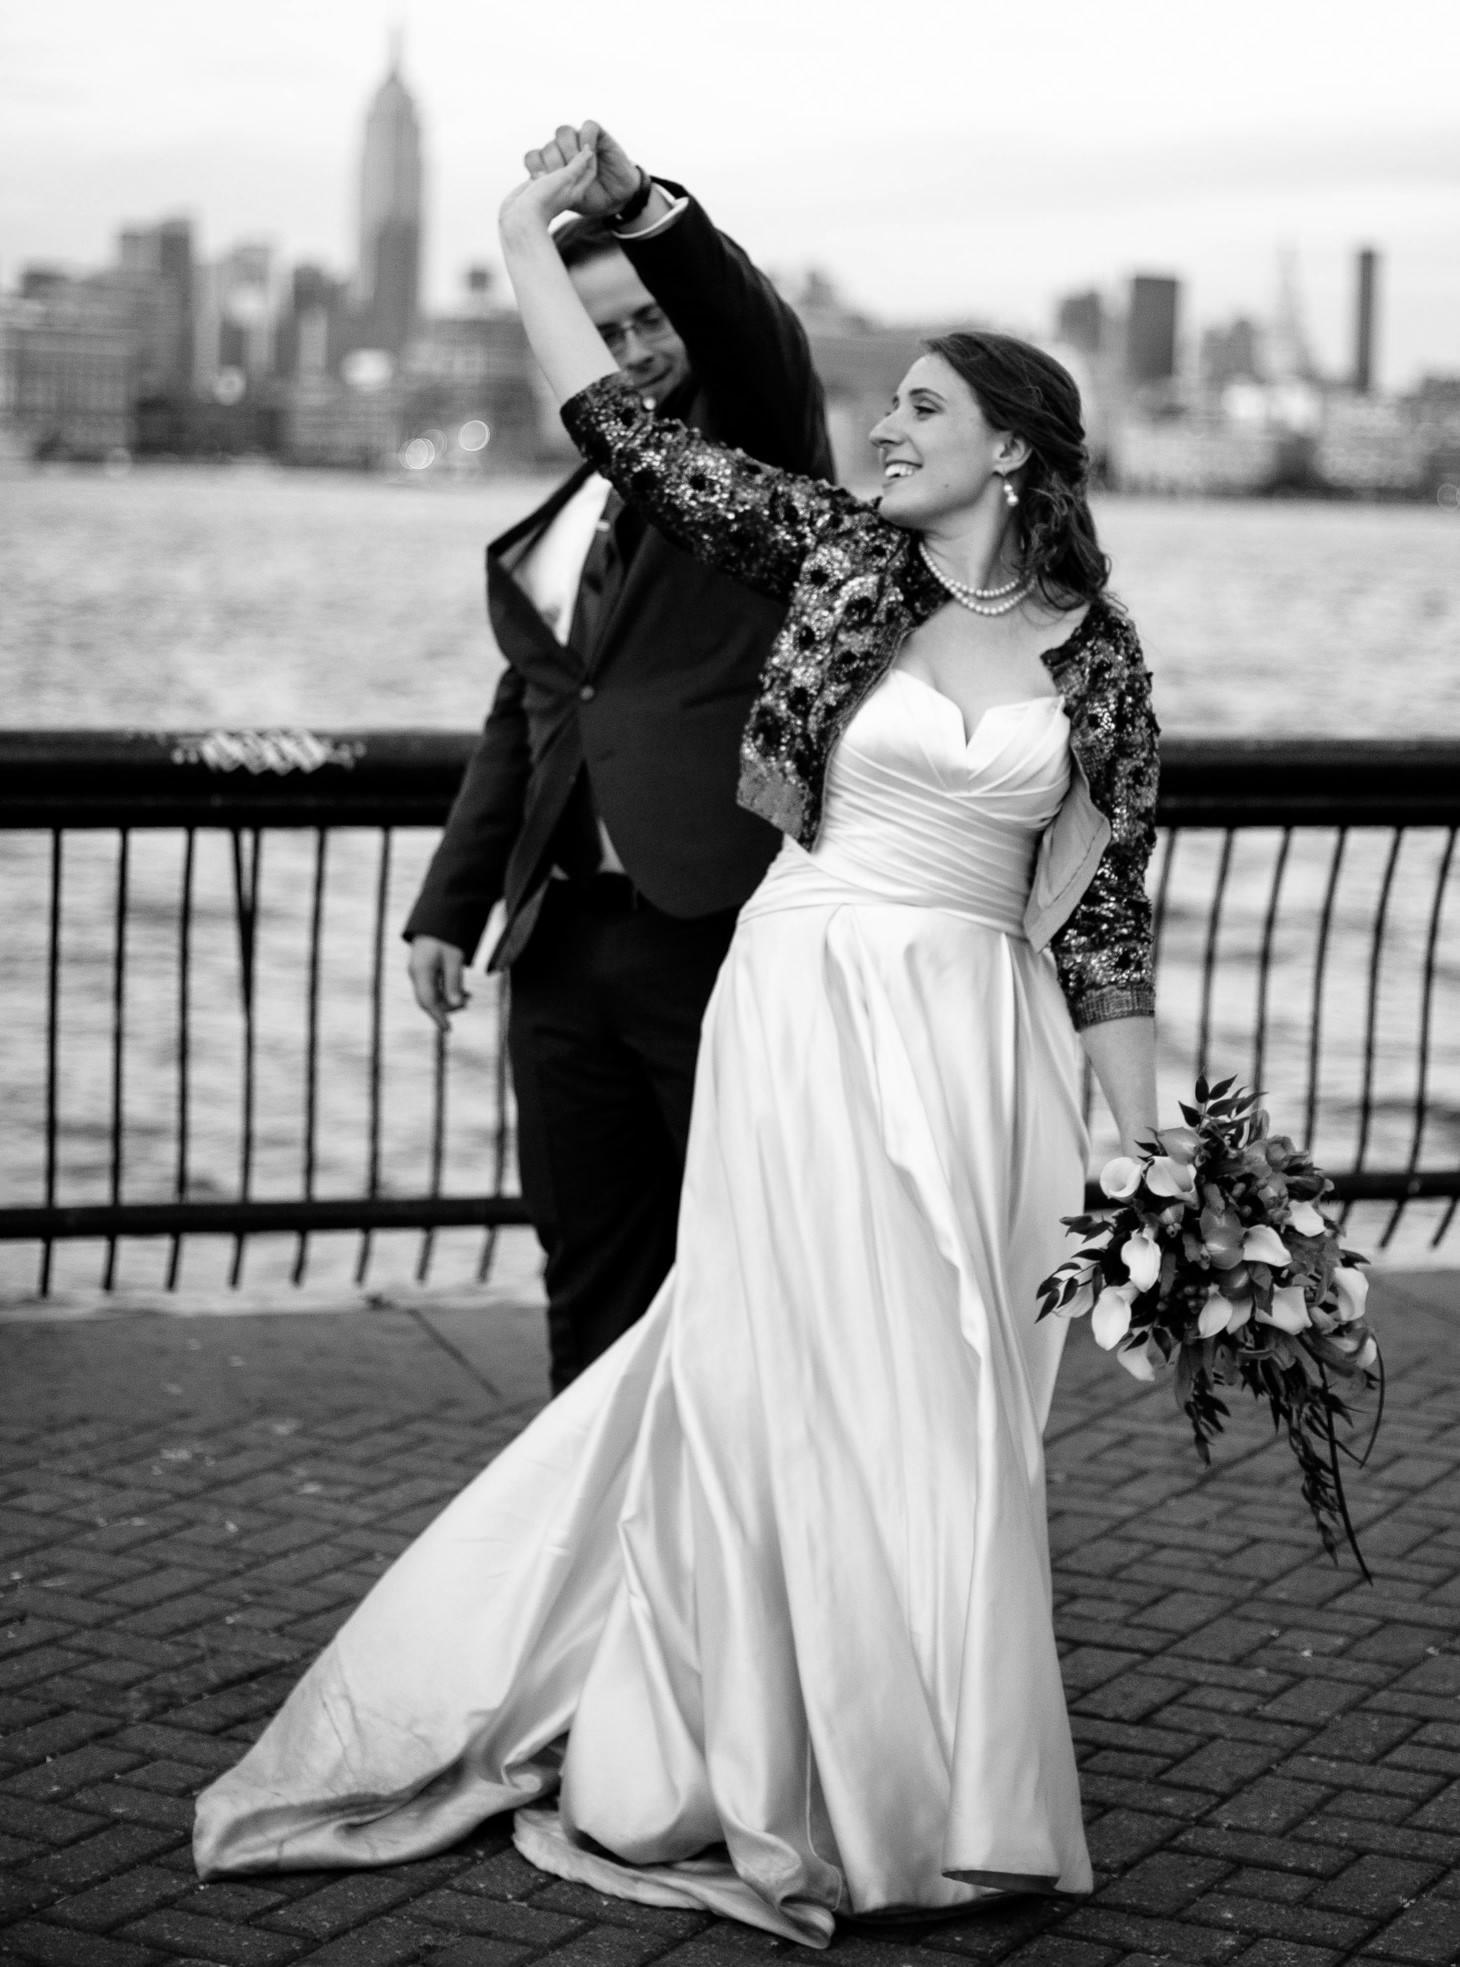 038-nyc-wedding-photographer-hoboken-waterfront-wedding-photos-smitten-chickens.jpg